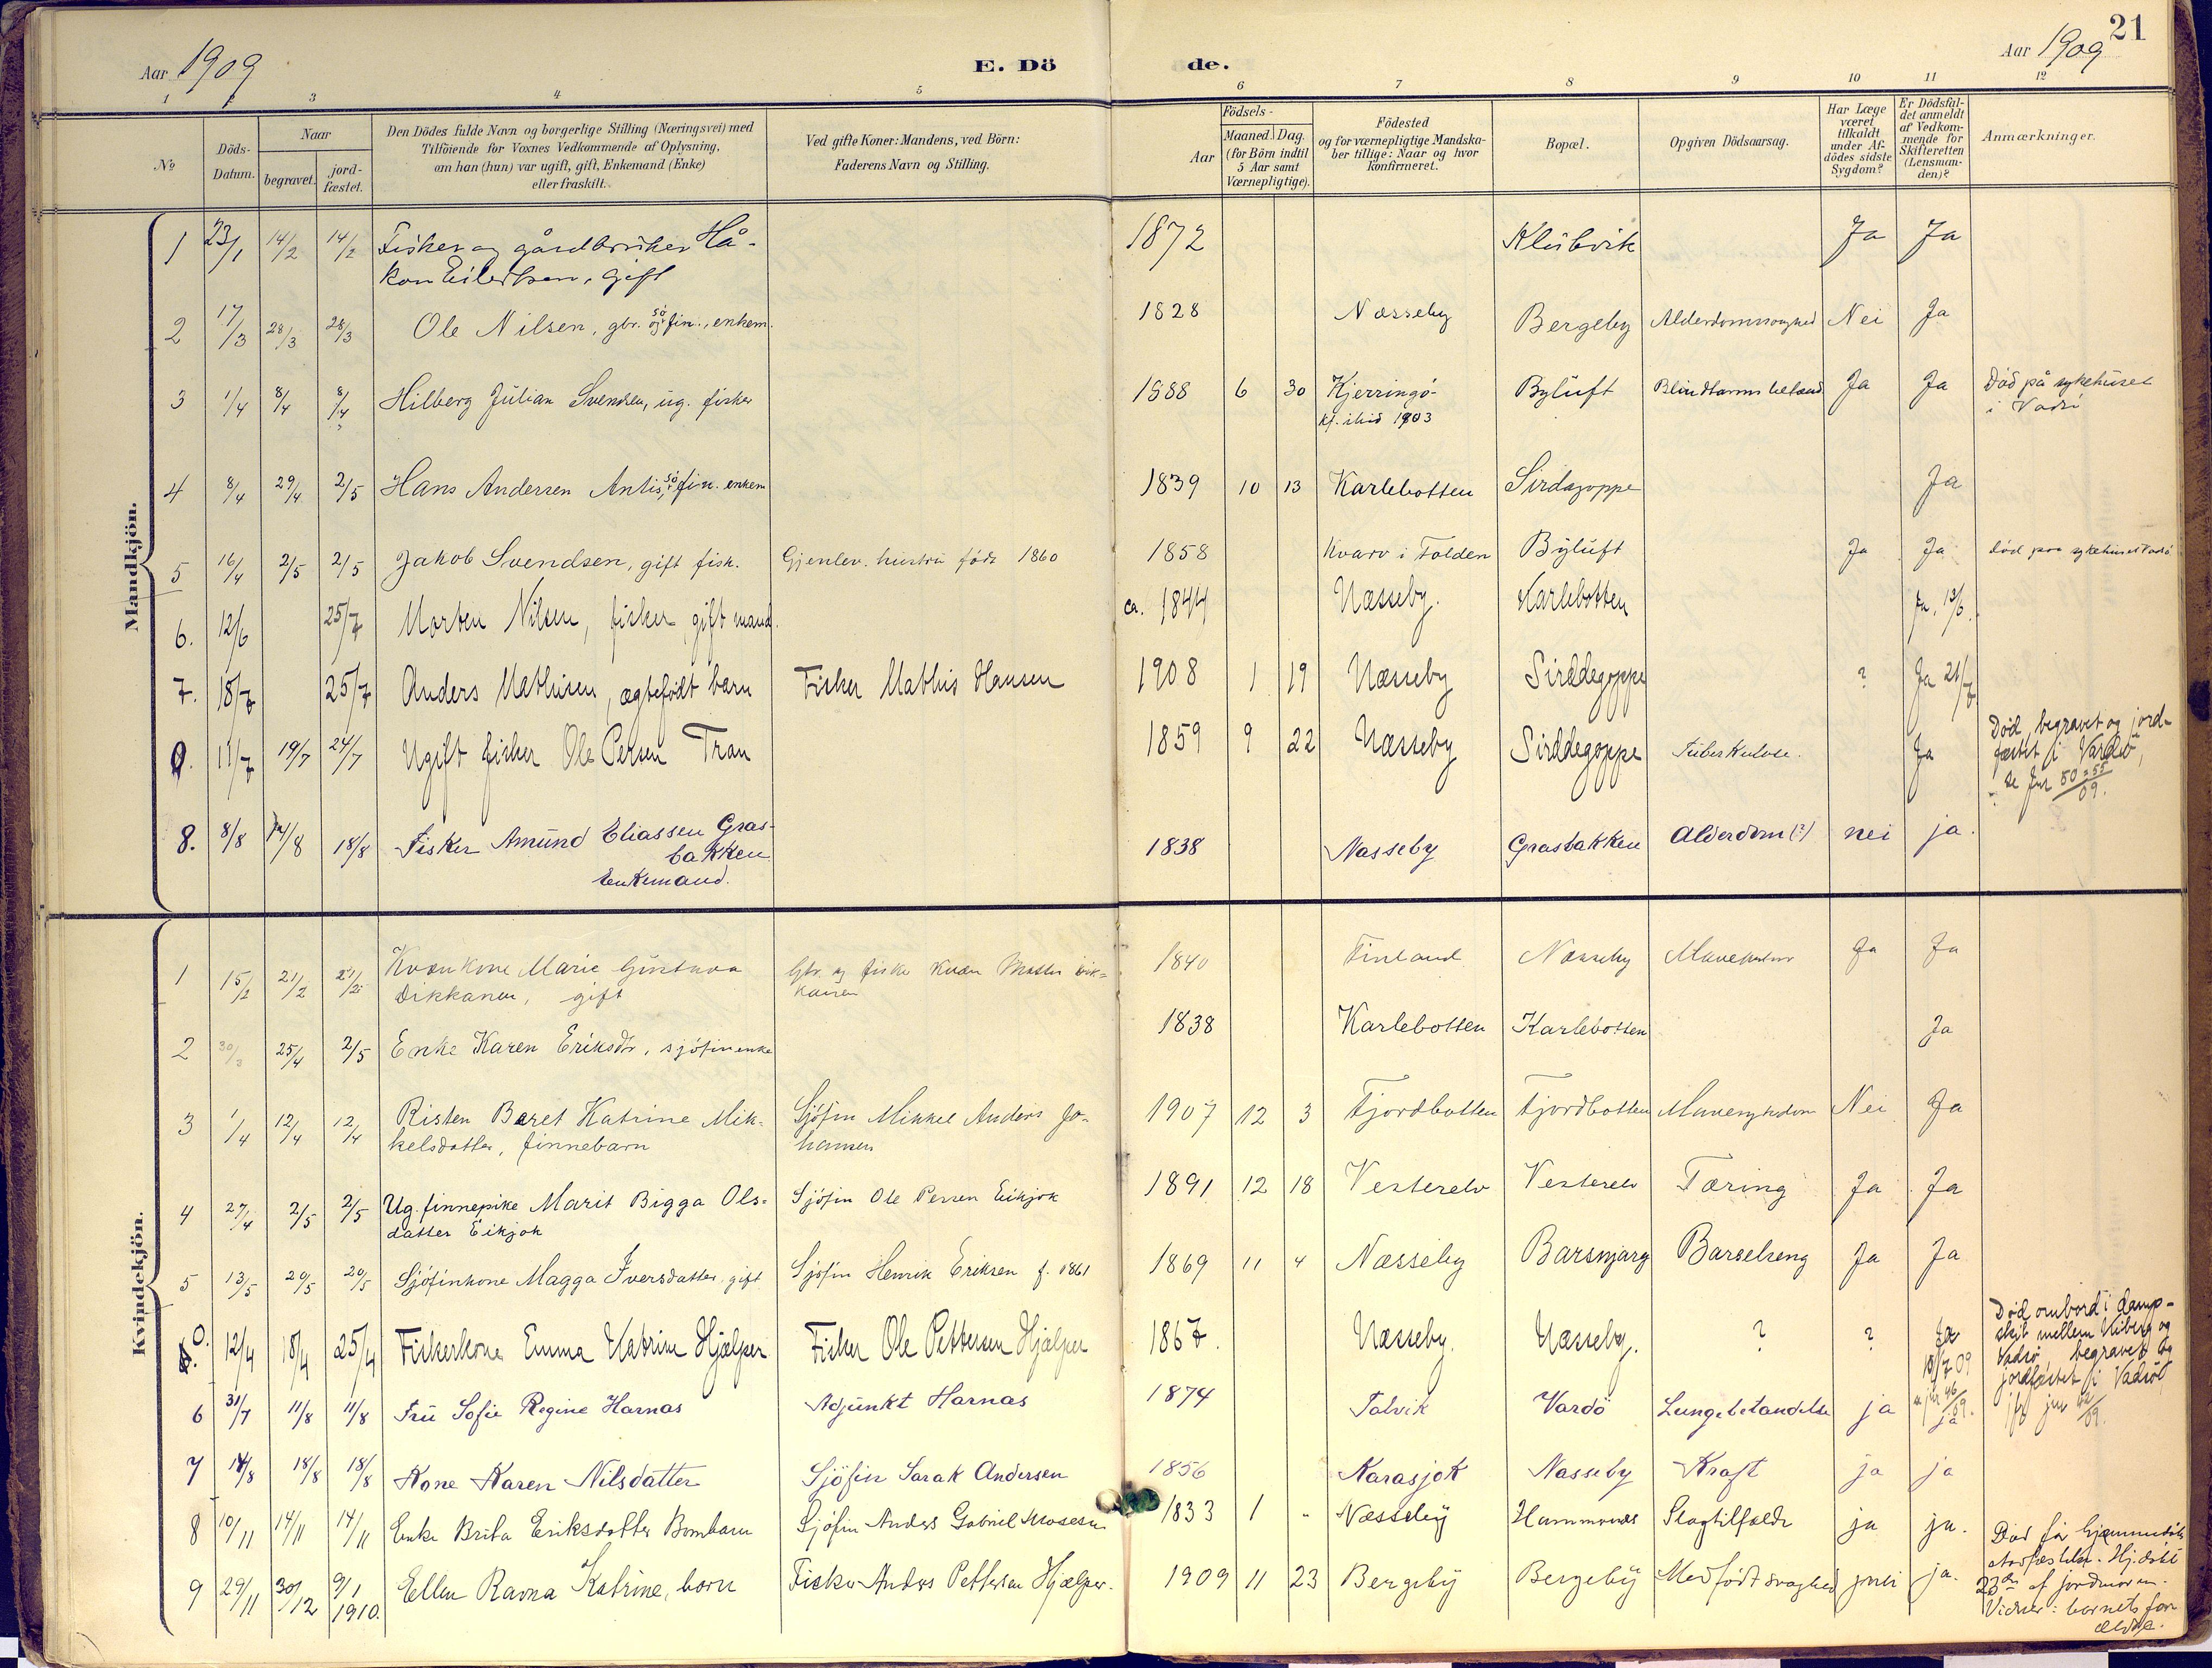 SATØ, Nesseby sokneprestkontor, H/Ha/L0007kirke: Ministerialbok nr. 7, 1898-1921, s. 21